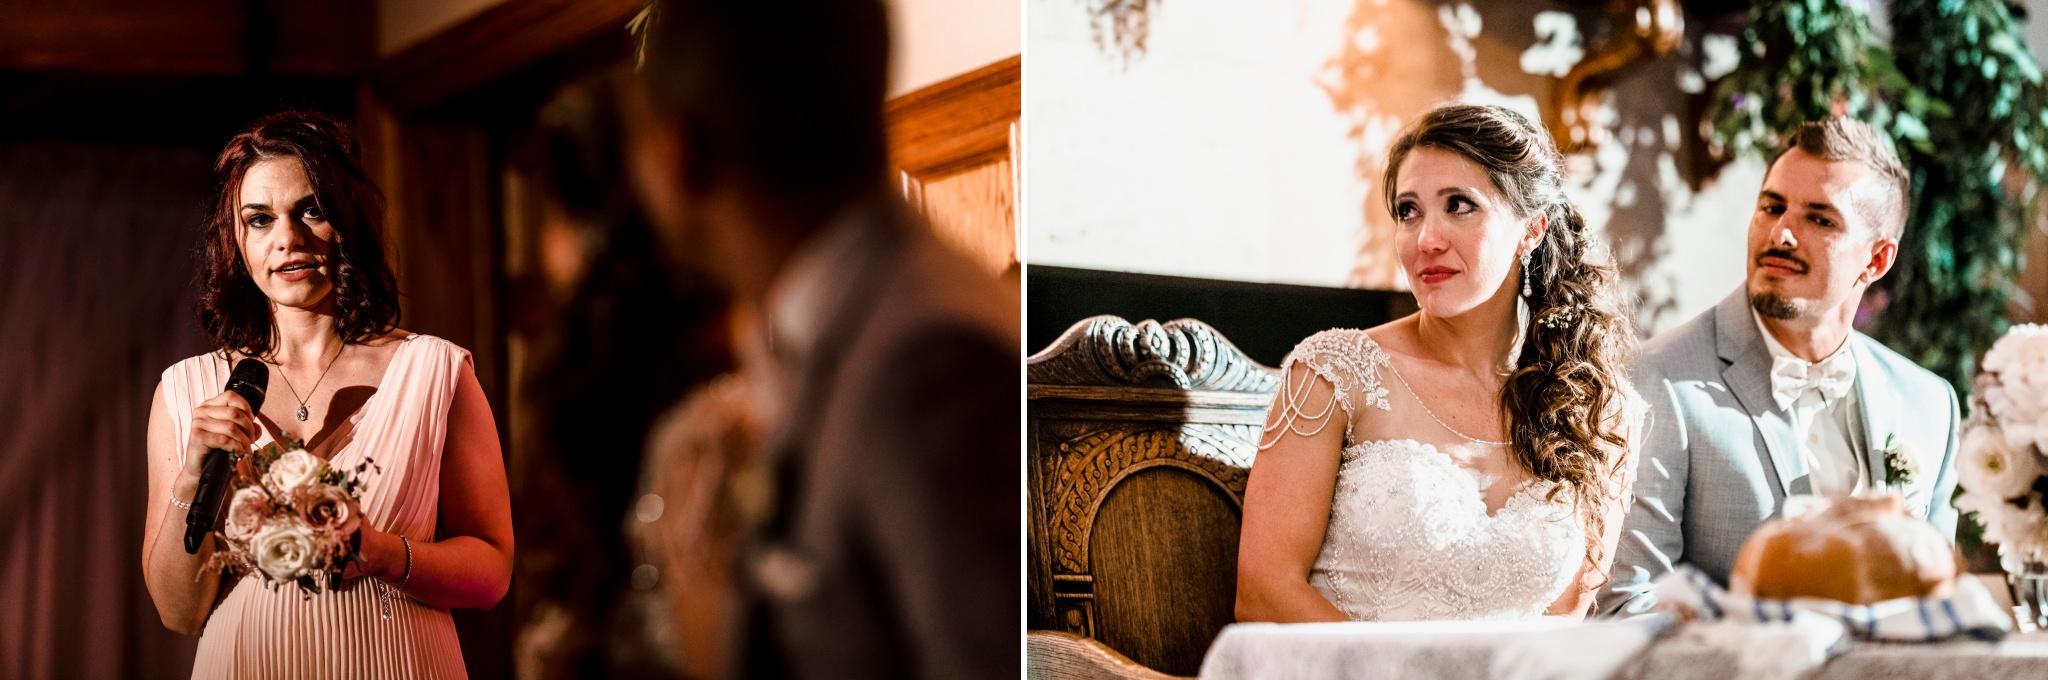 Barbato-Moorestown-Community-House-Wedding-New-Jersey-Photographer-51.JPG